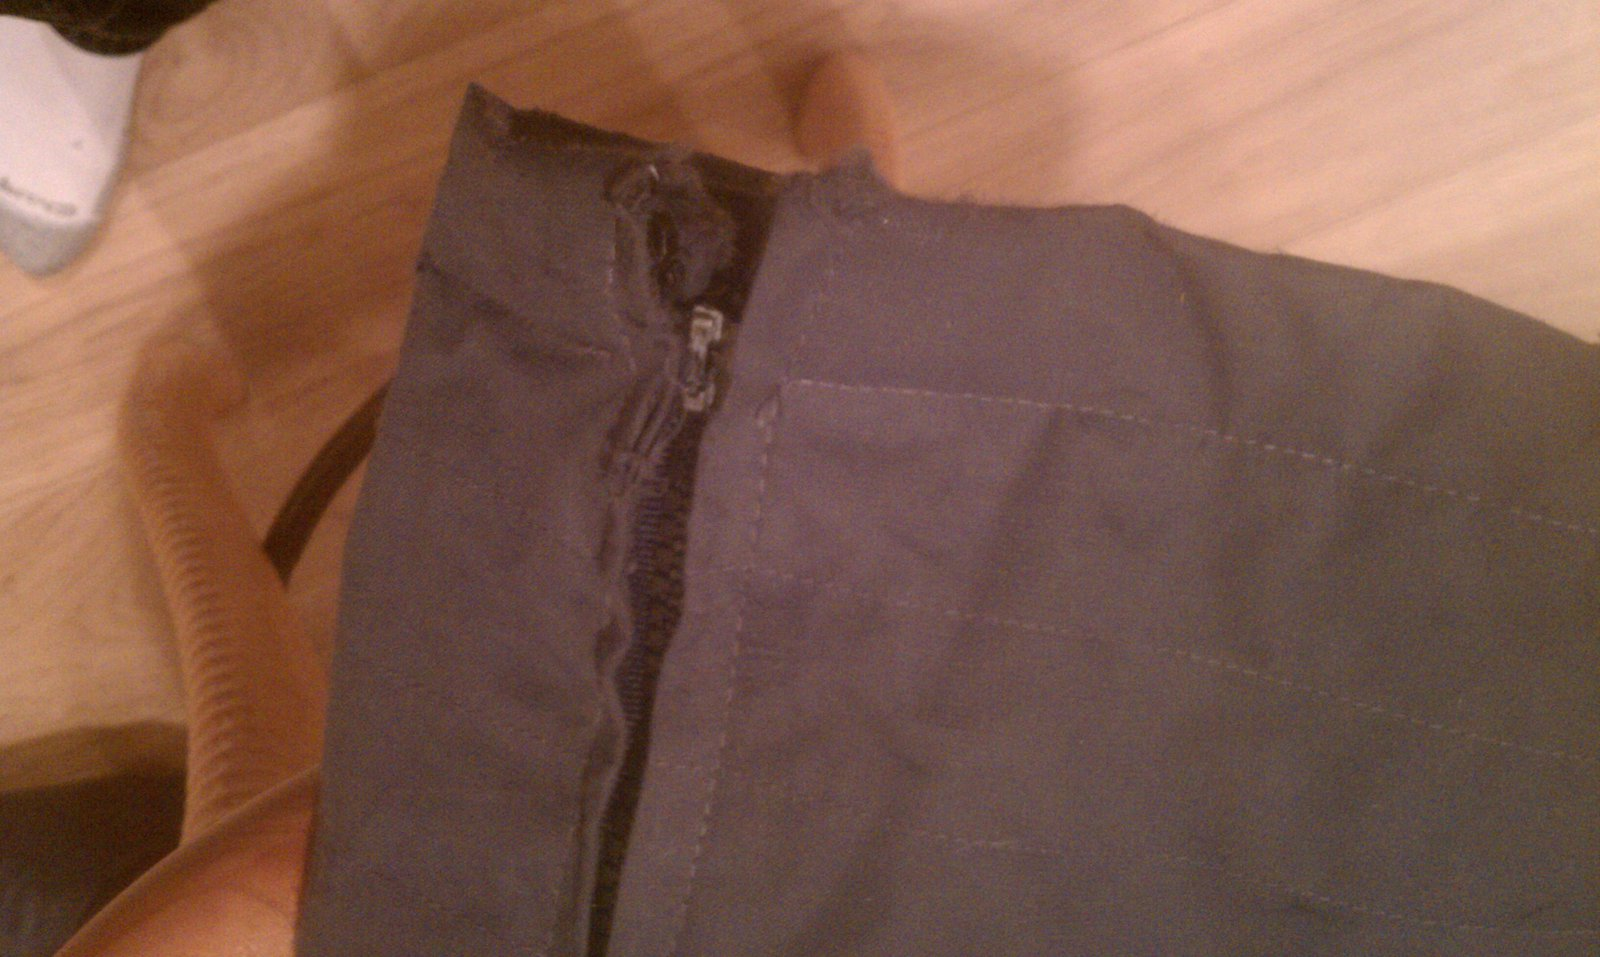 Zipper damage